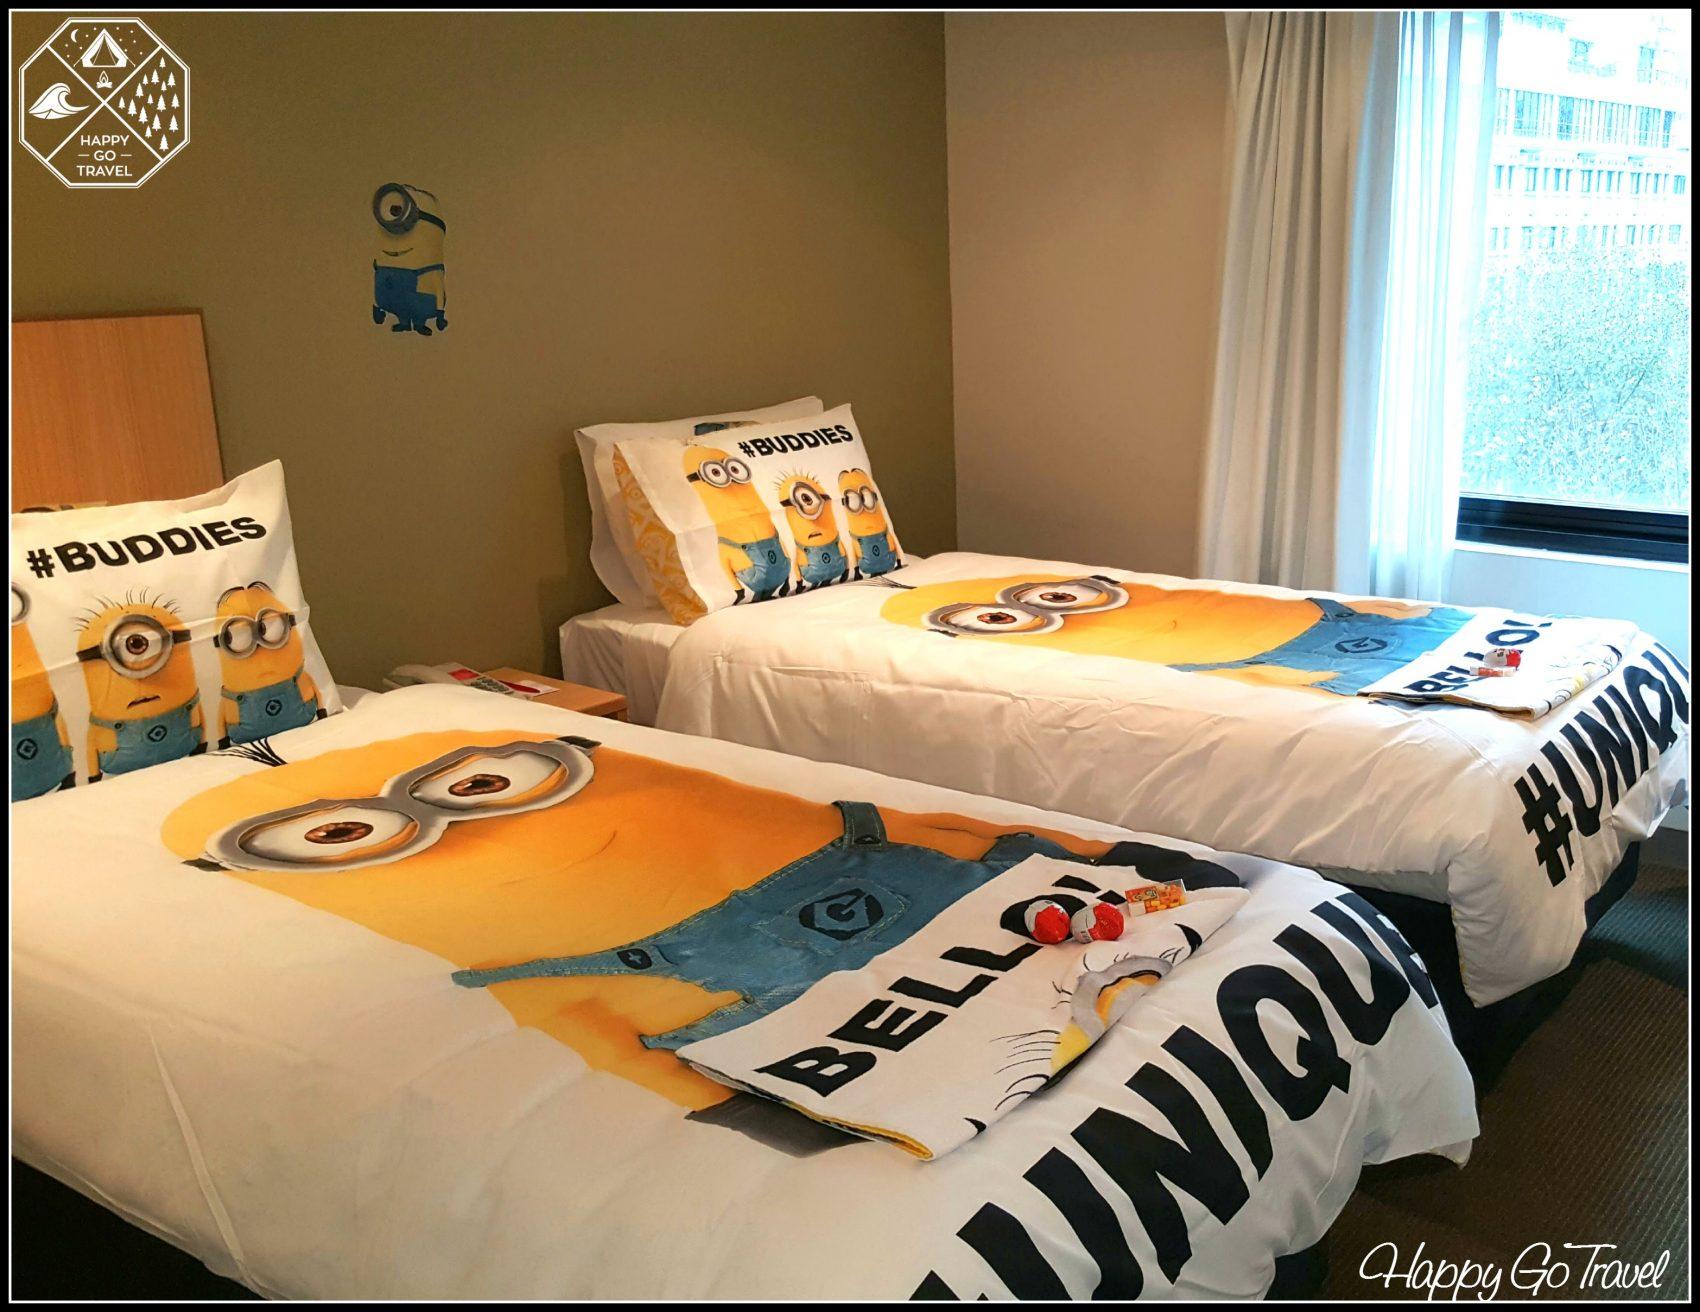 Travelodge Hotel Minion makeover